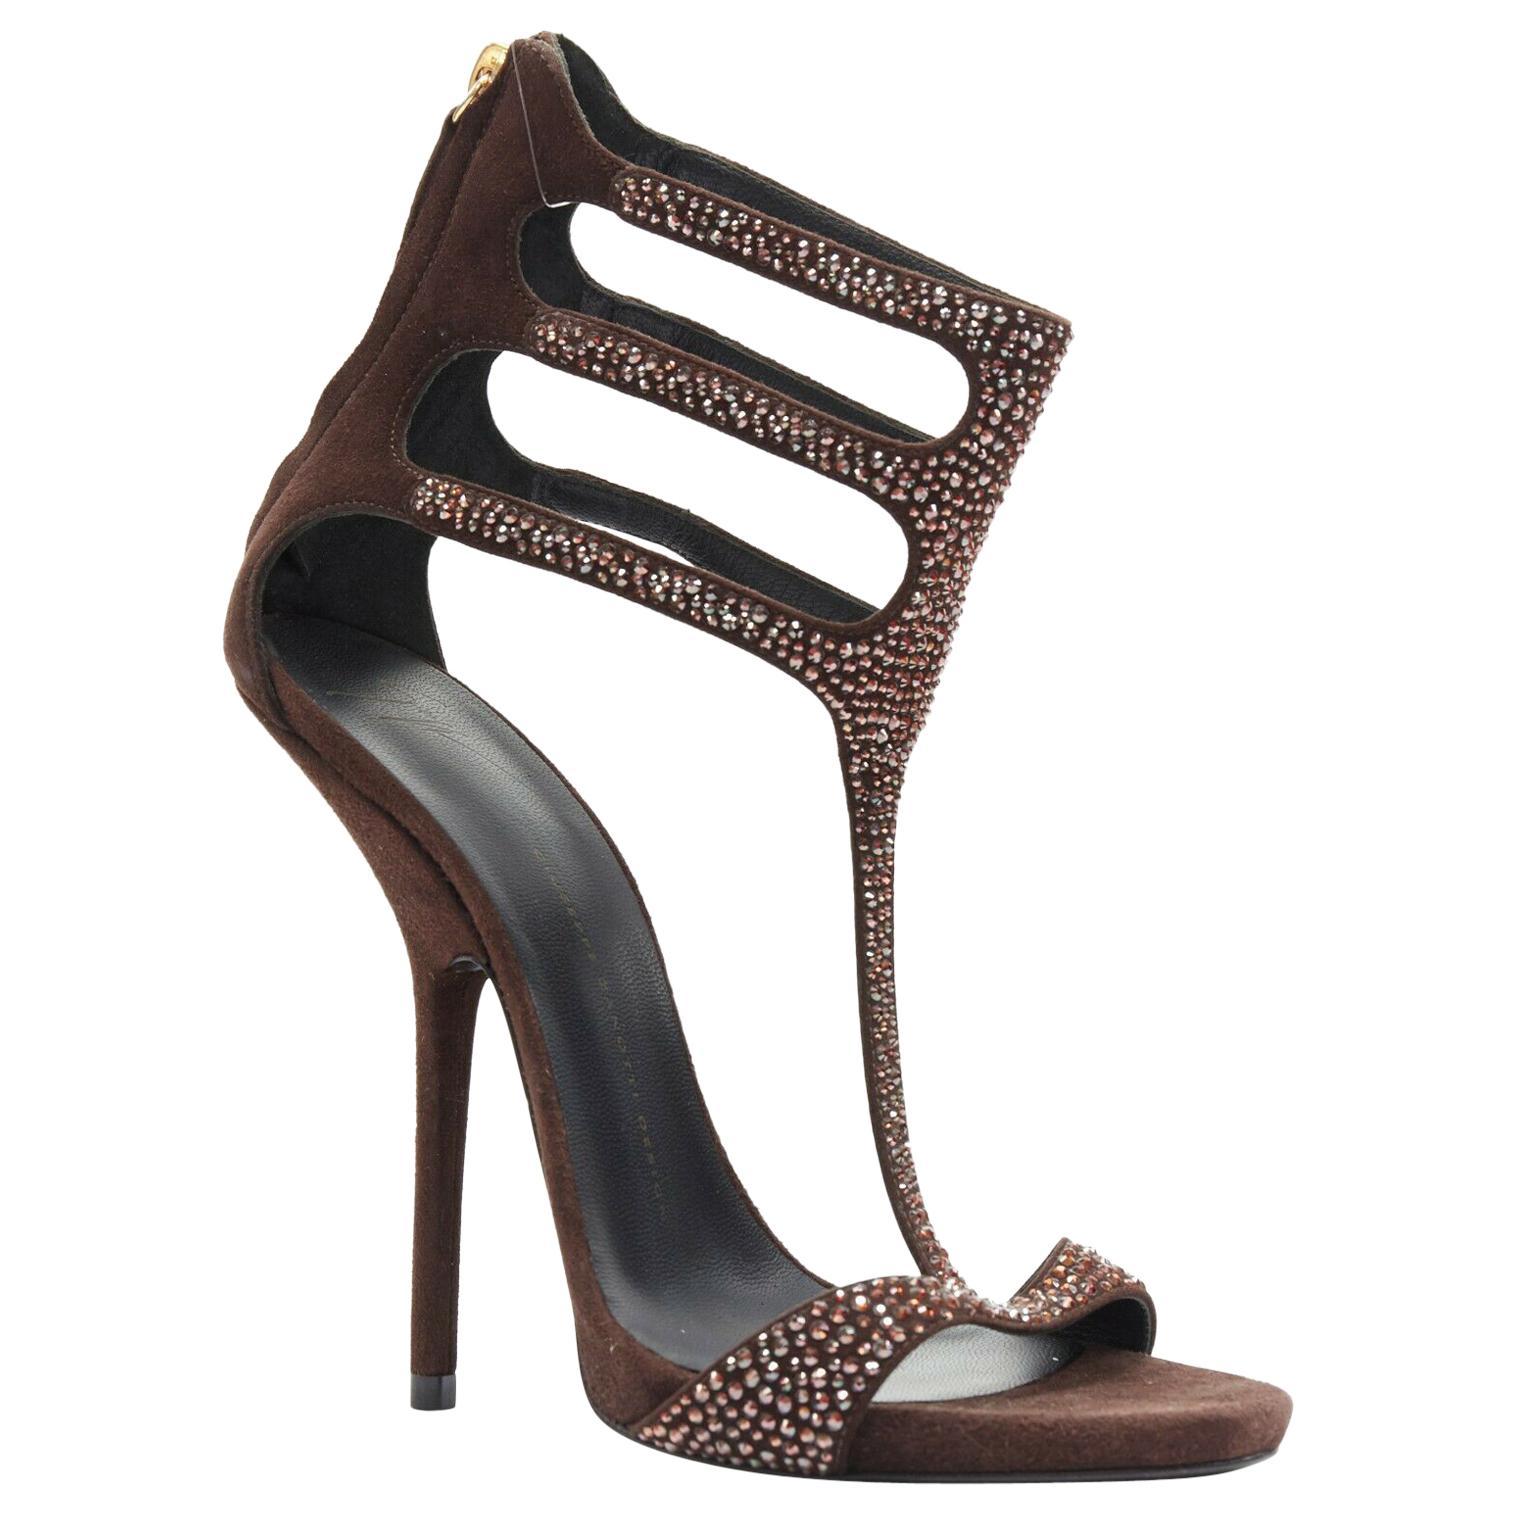 new GIUSEPPE ZANOTTI brown crystal strass T-strap curved heel sandal EU40.5